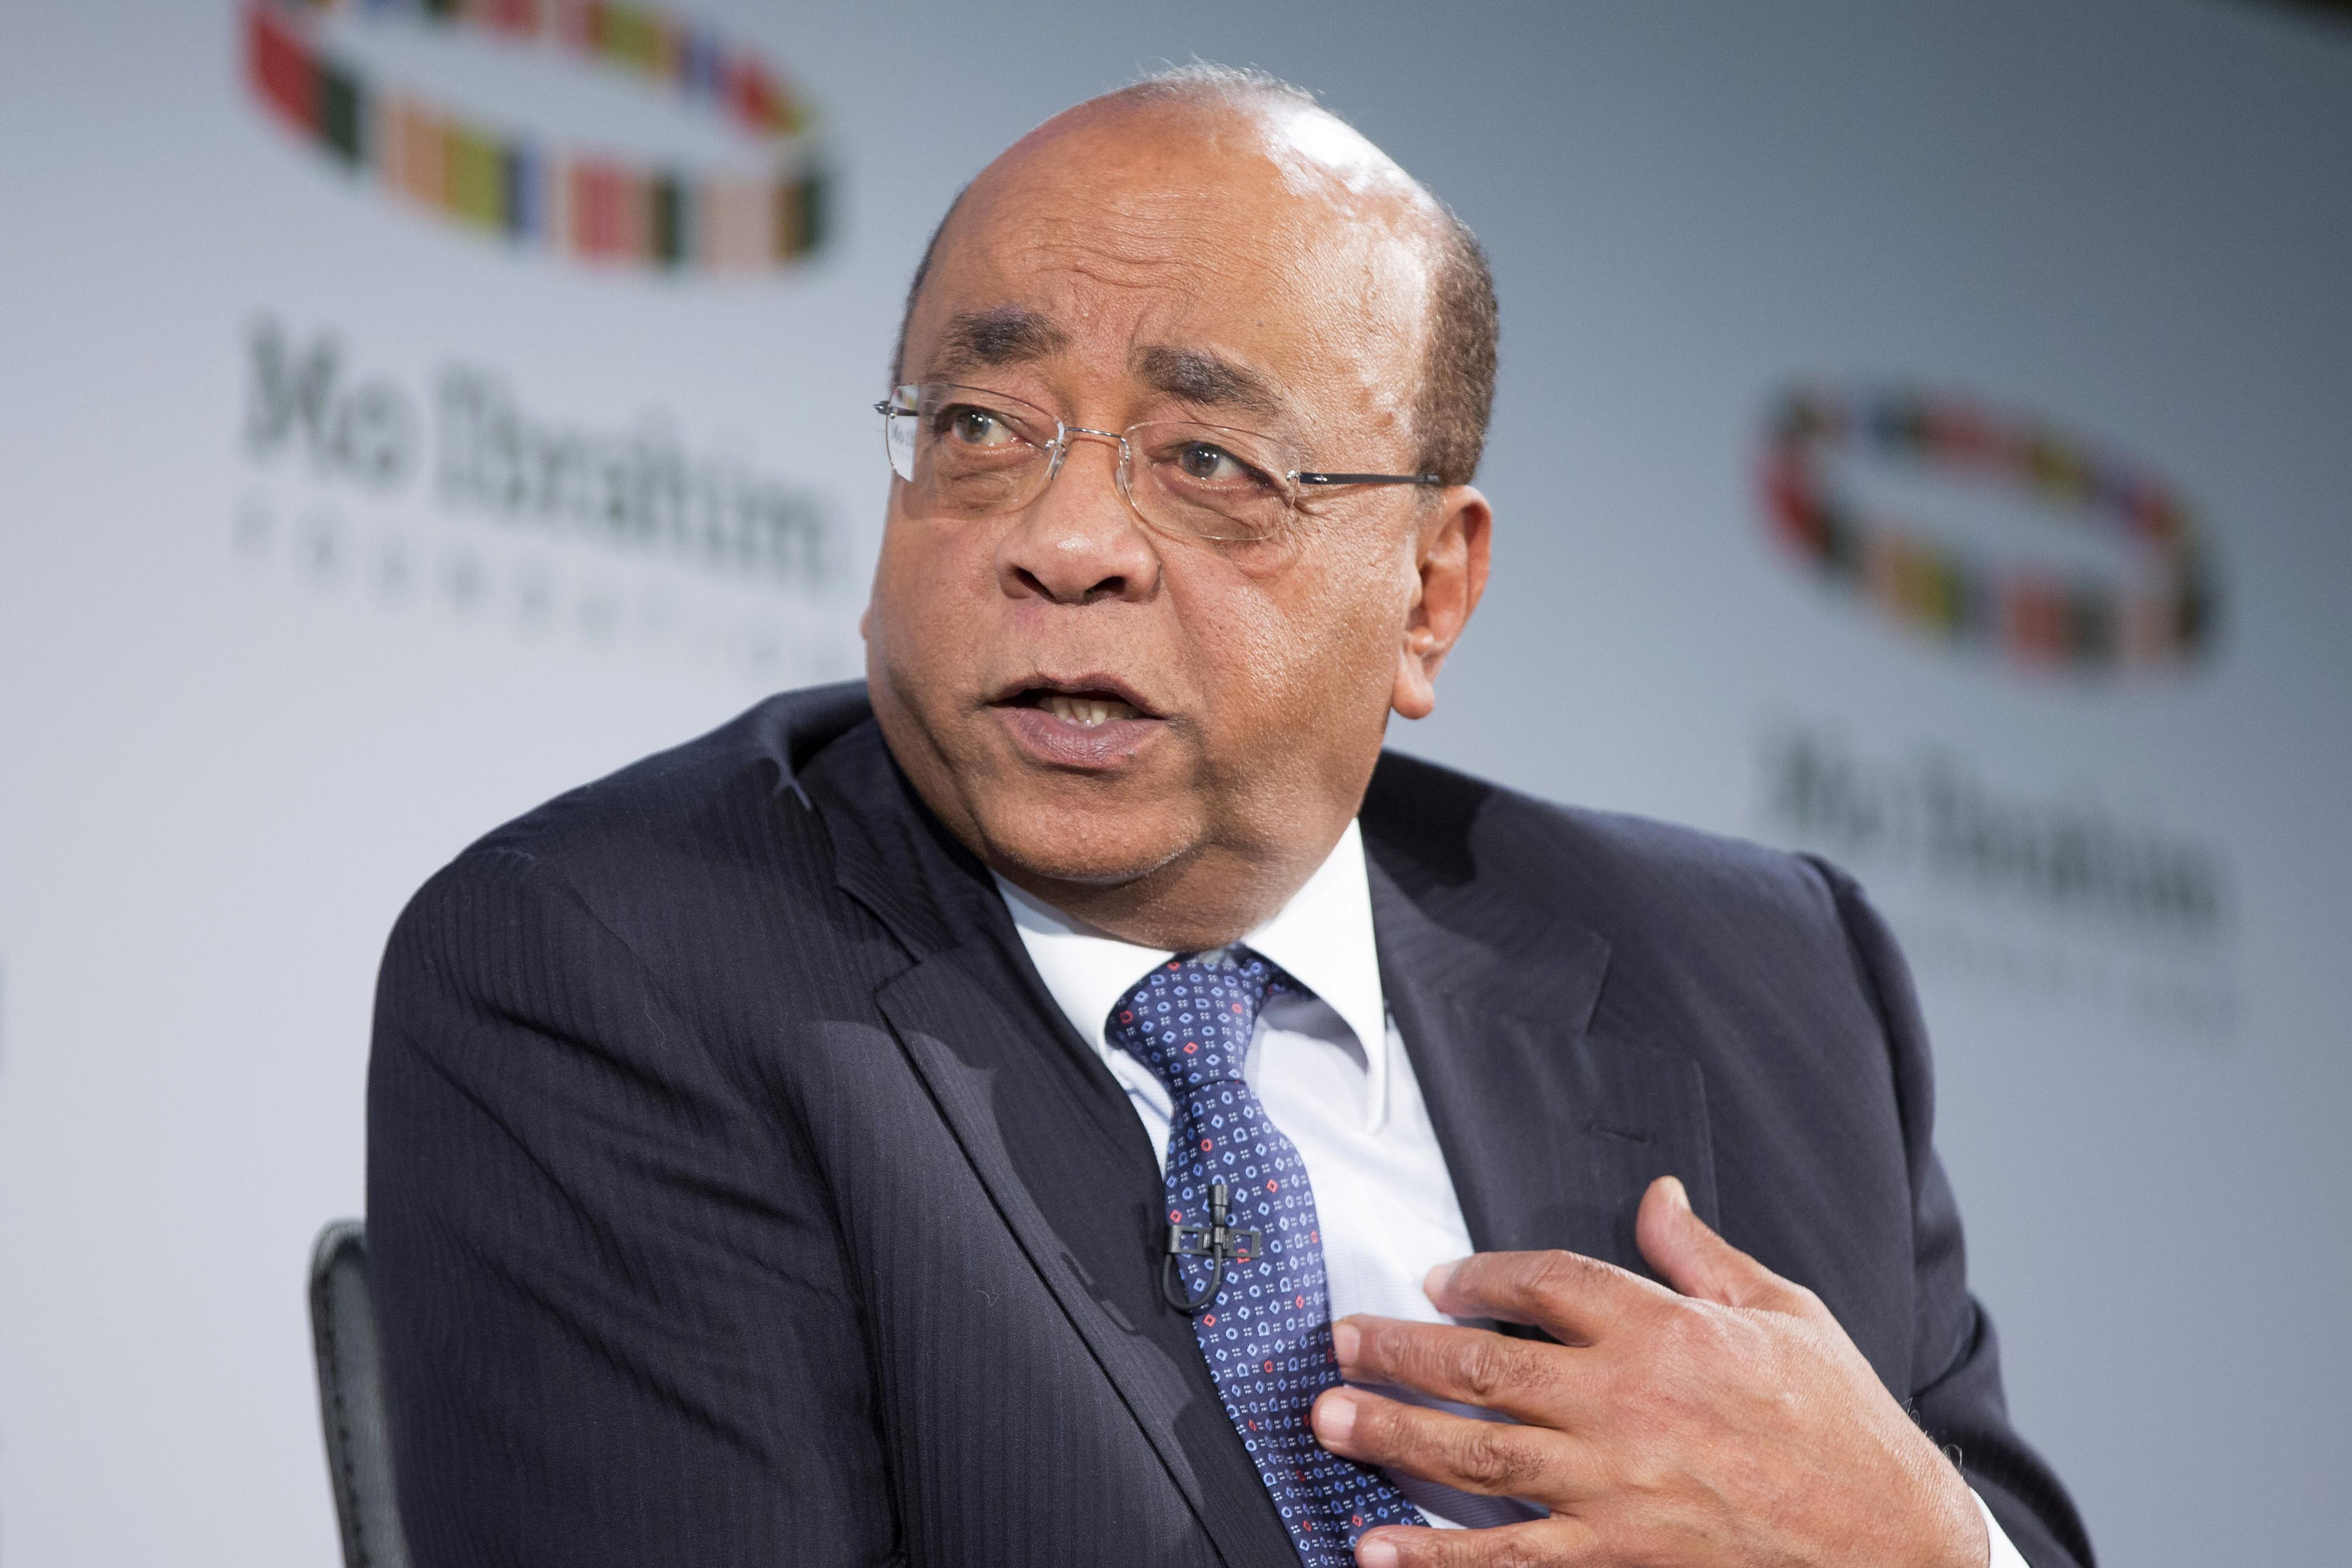 Billionaire Philanthropist Mo Ibrahim News Conference And Interview